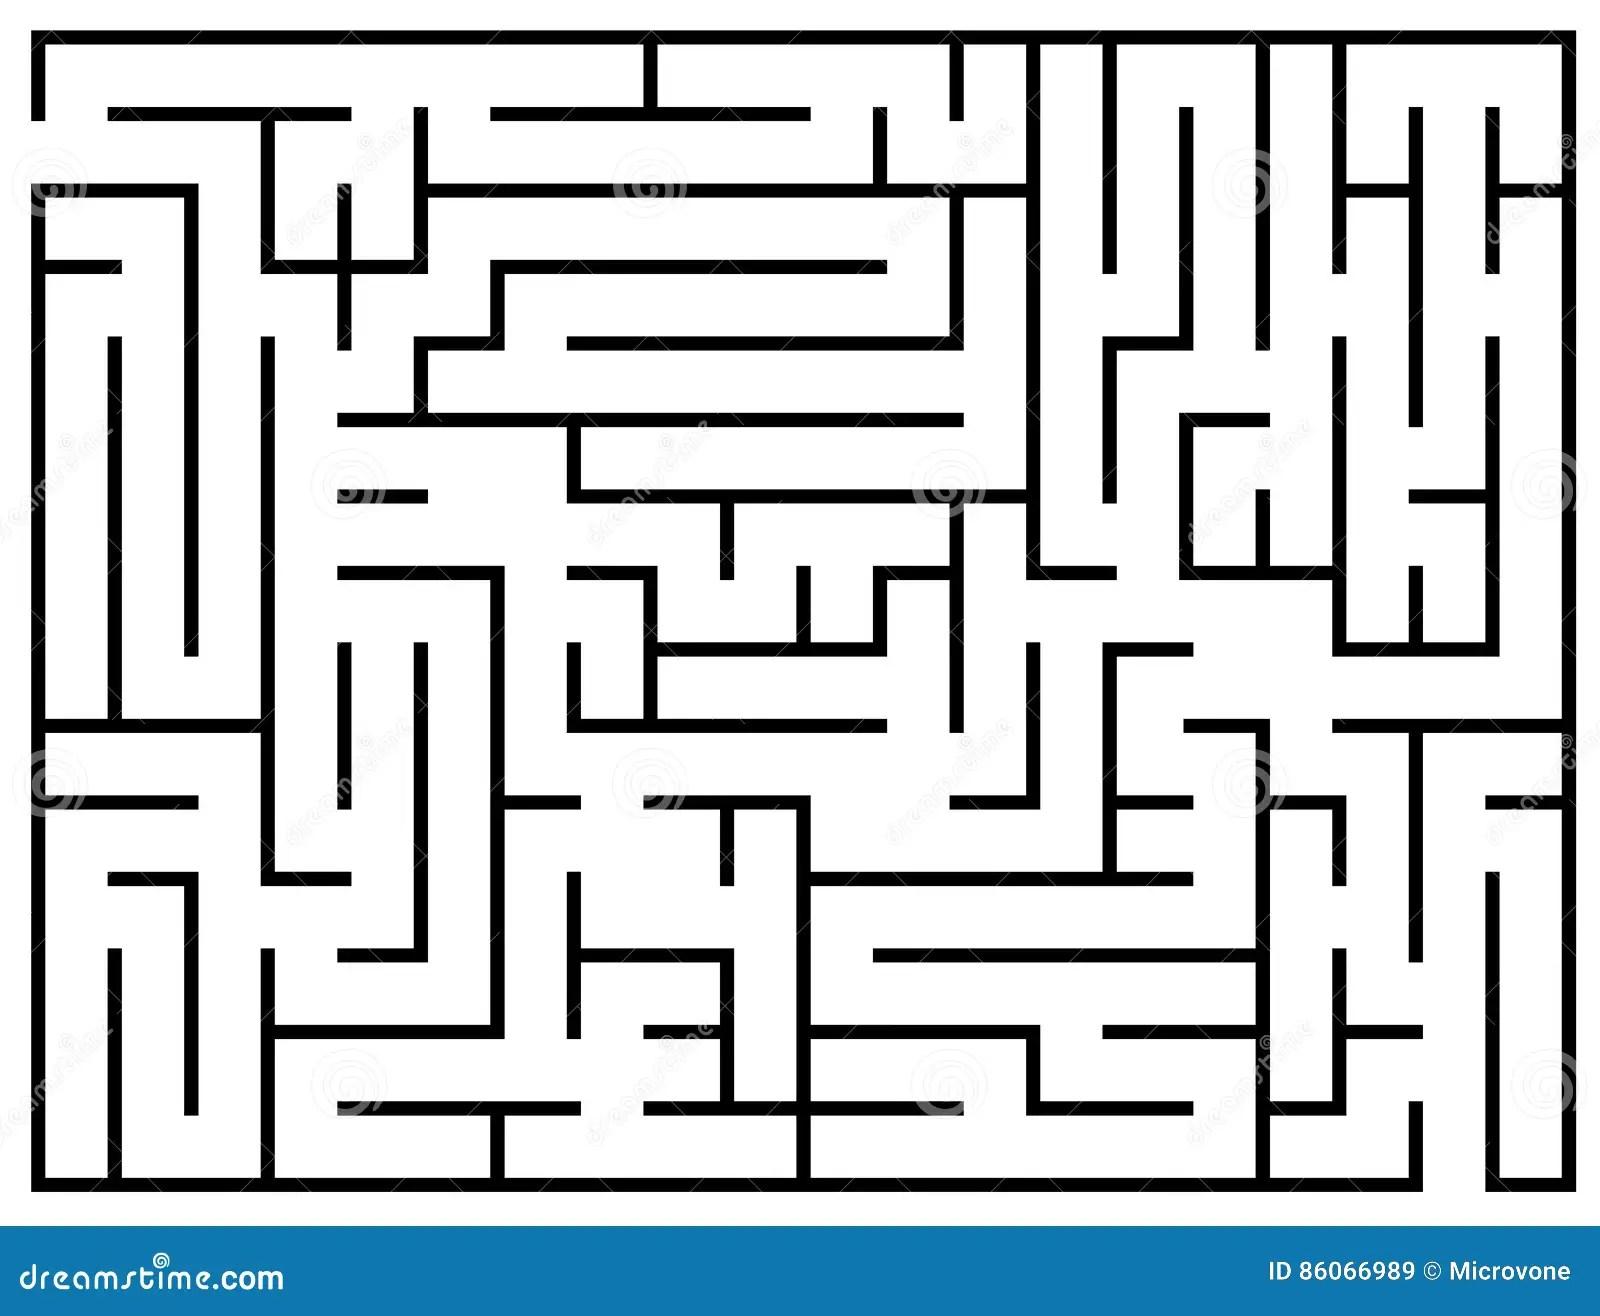 Heart Maze Printable Worksheet